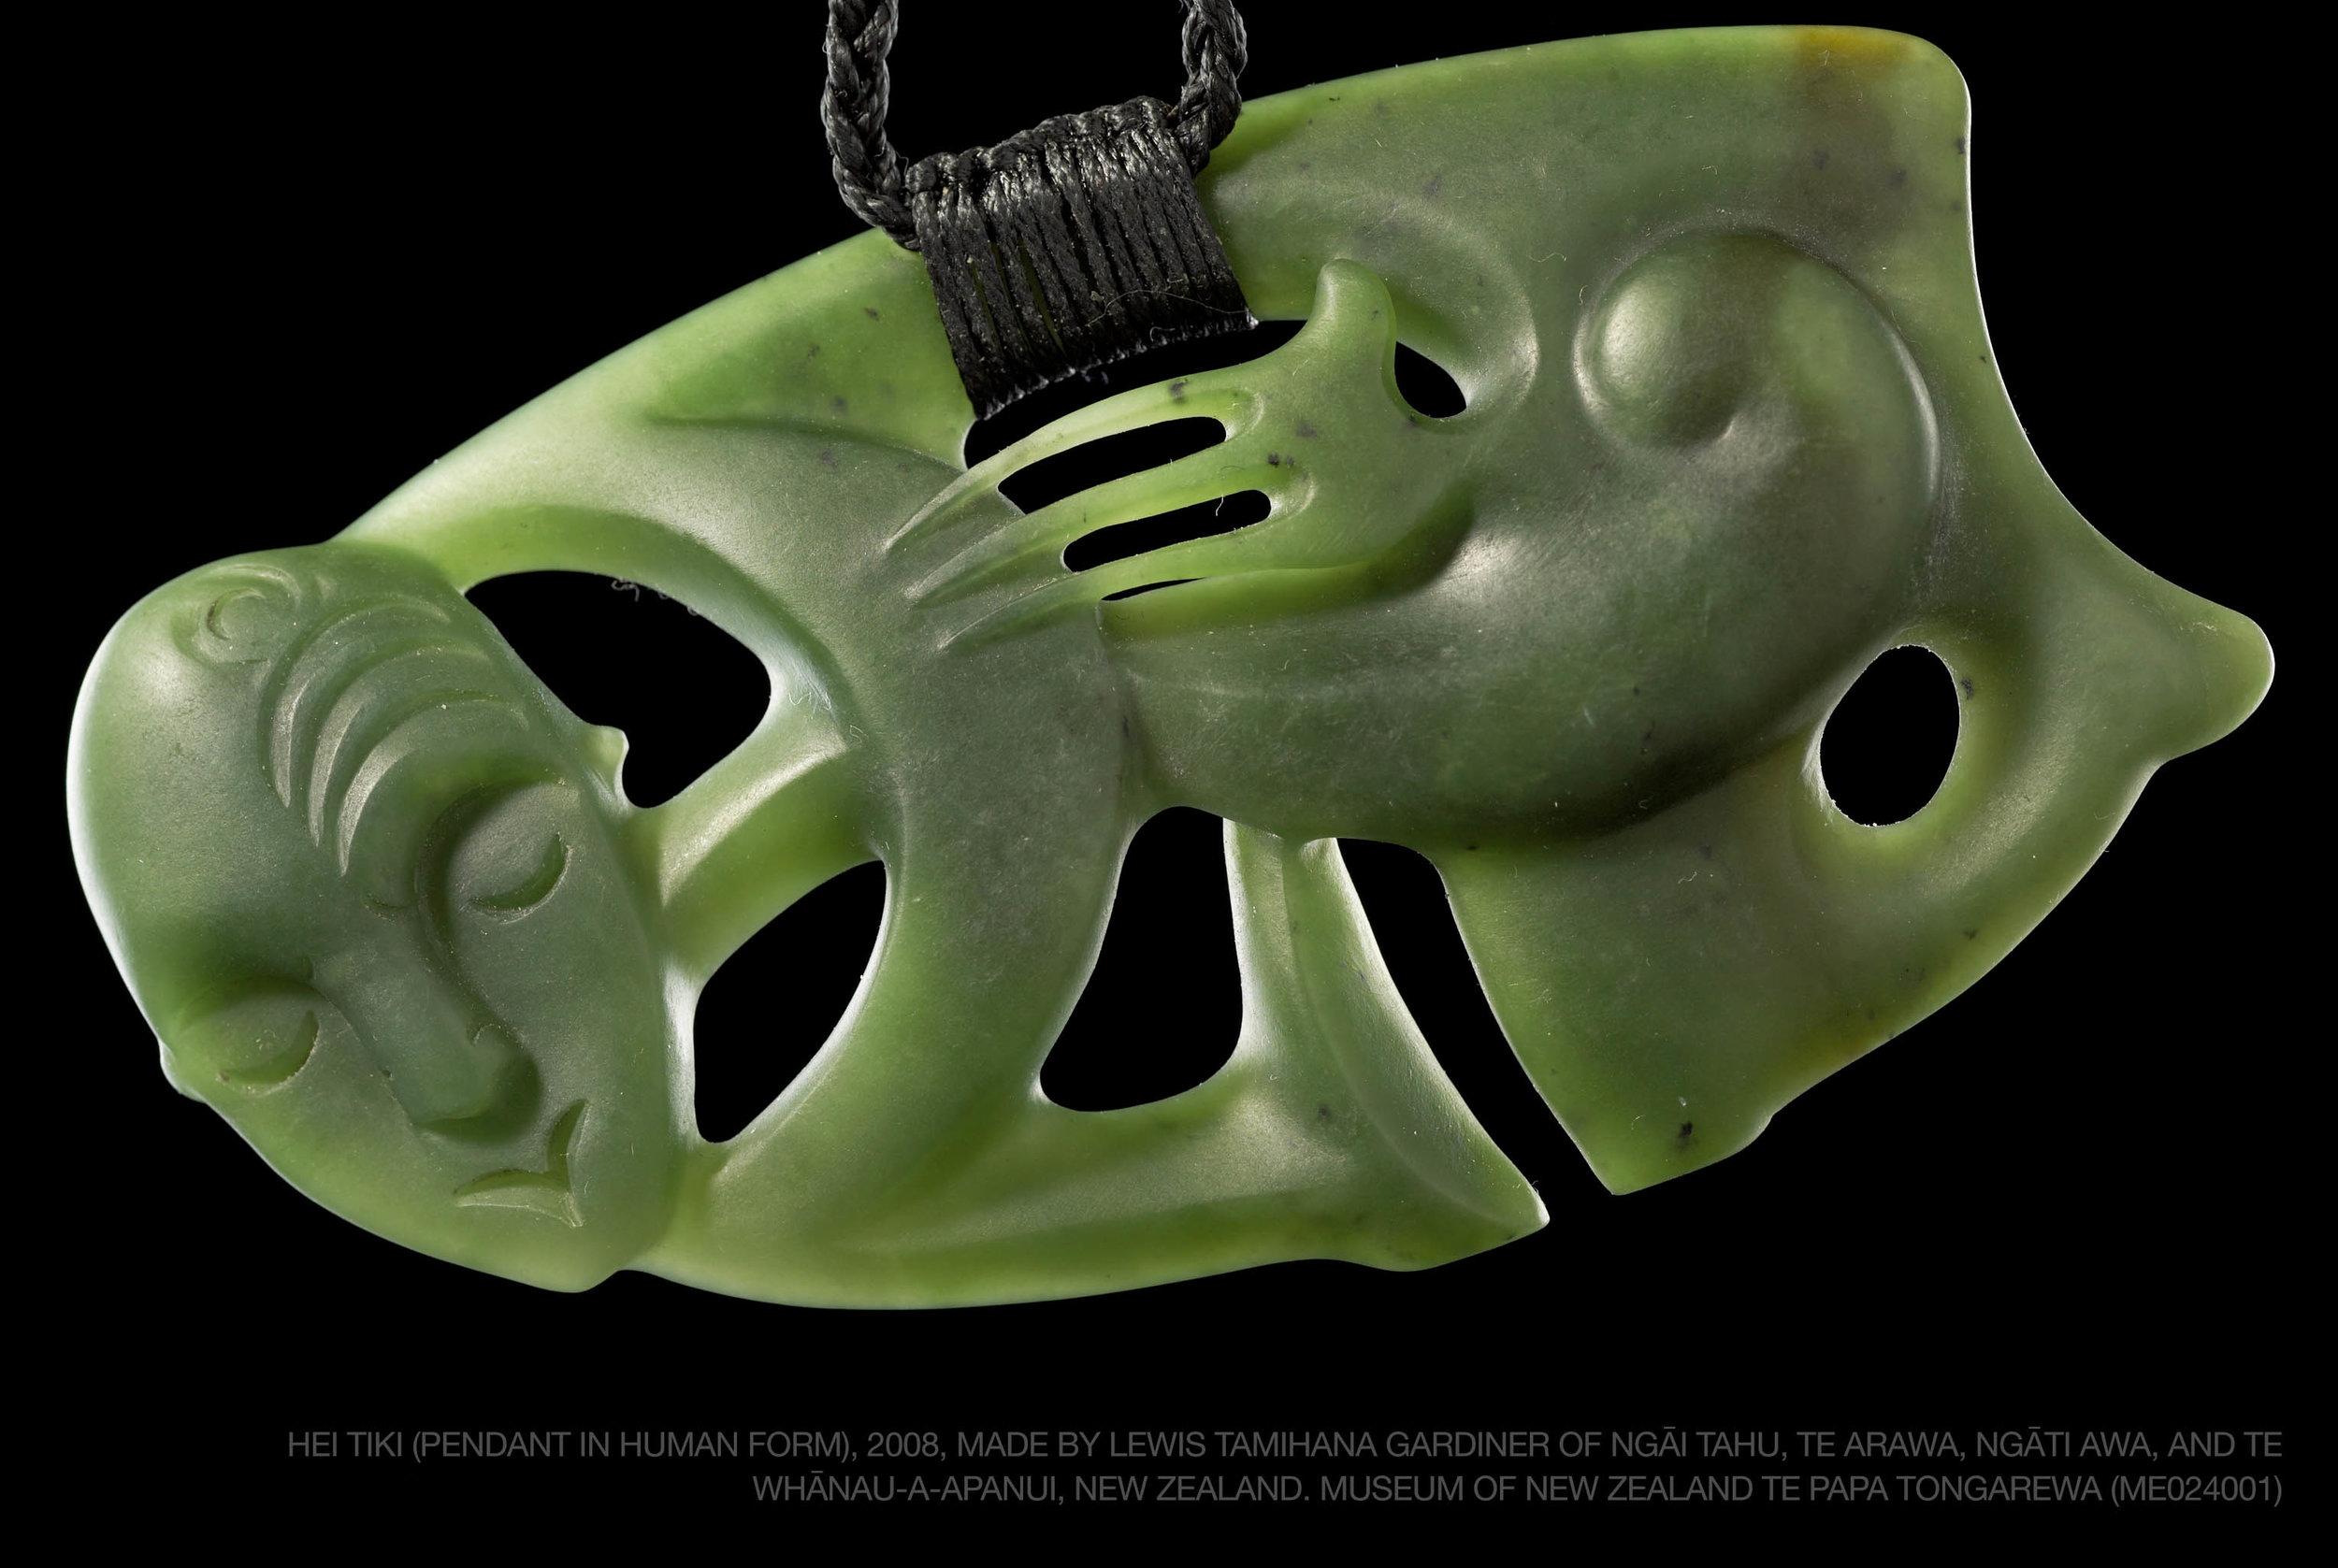 Hei tiki (pendant in human form), 2008, made by Lewis Tamihana Gardiner of Ngāi Tahu....jpg